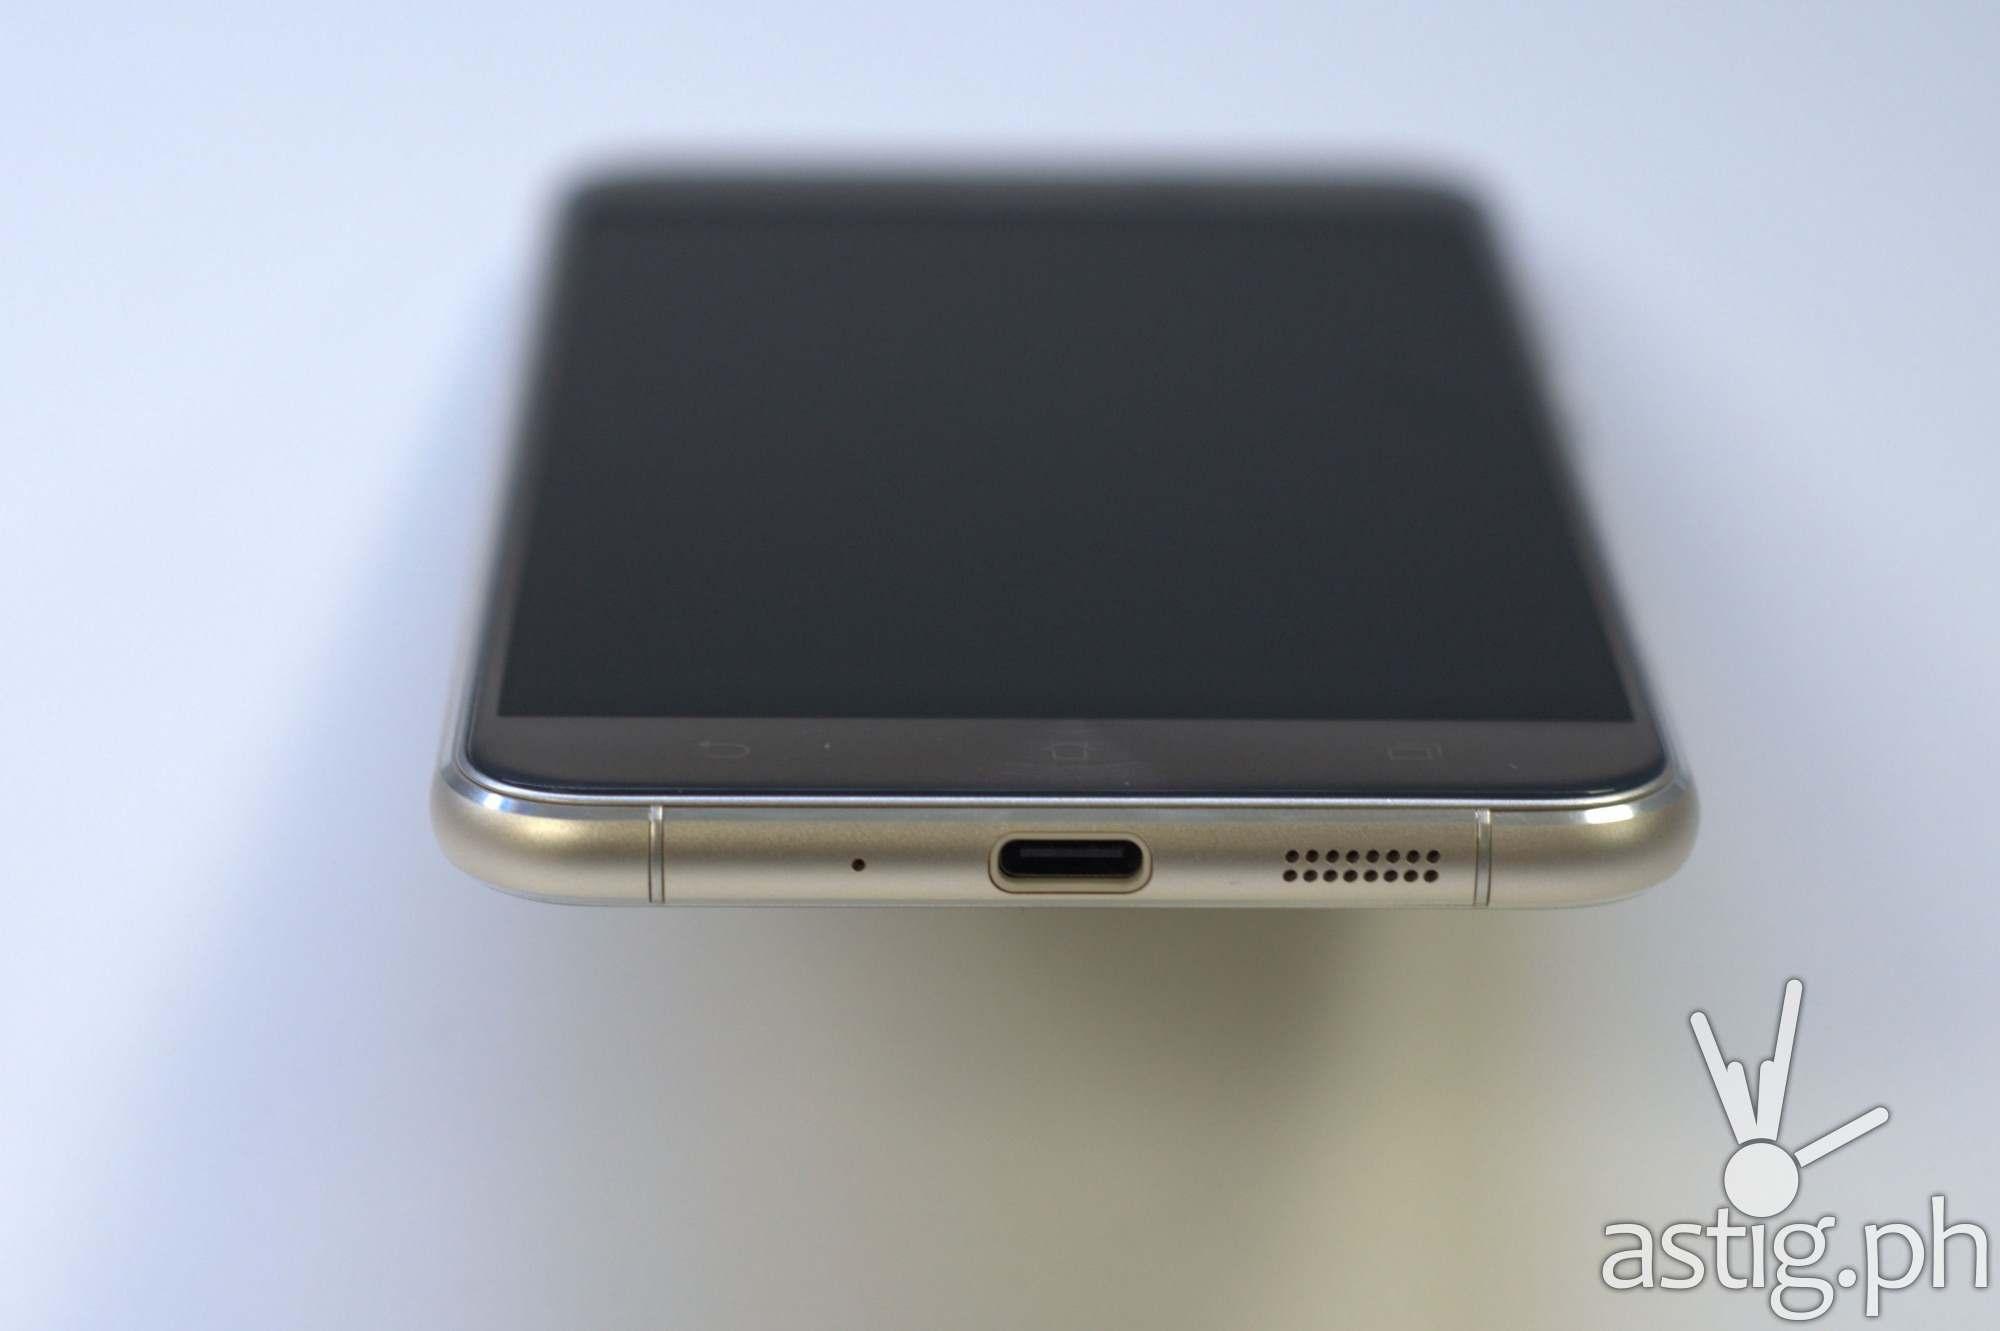 ASUS ZenFone 3 bottom showing USB Type-C port and loud speaker